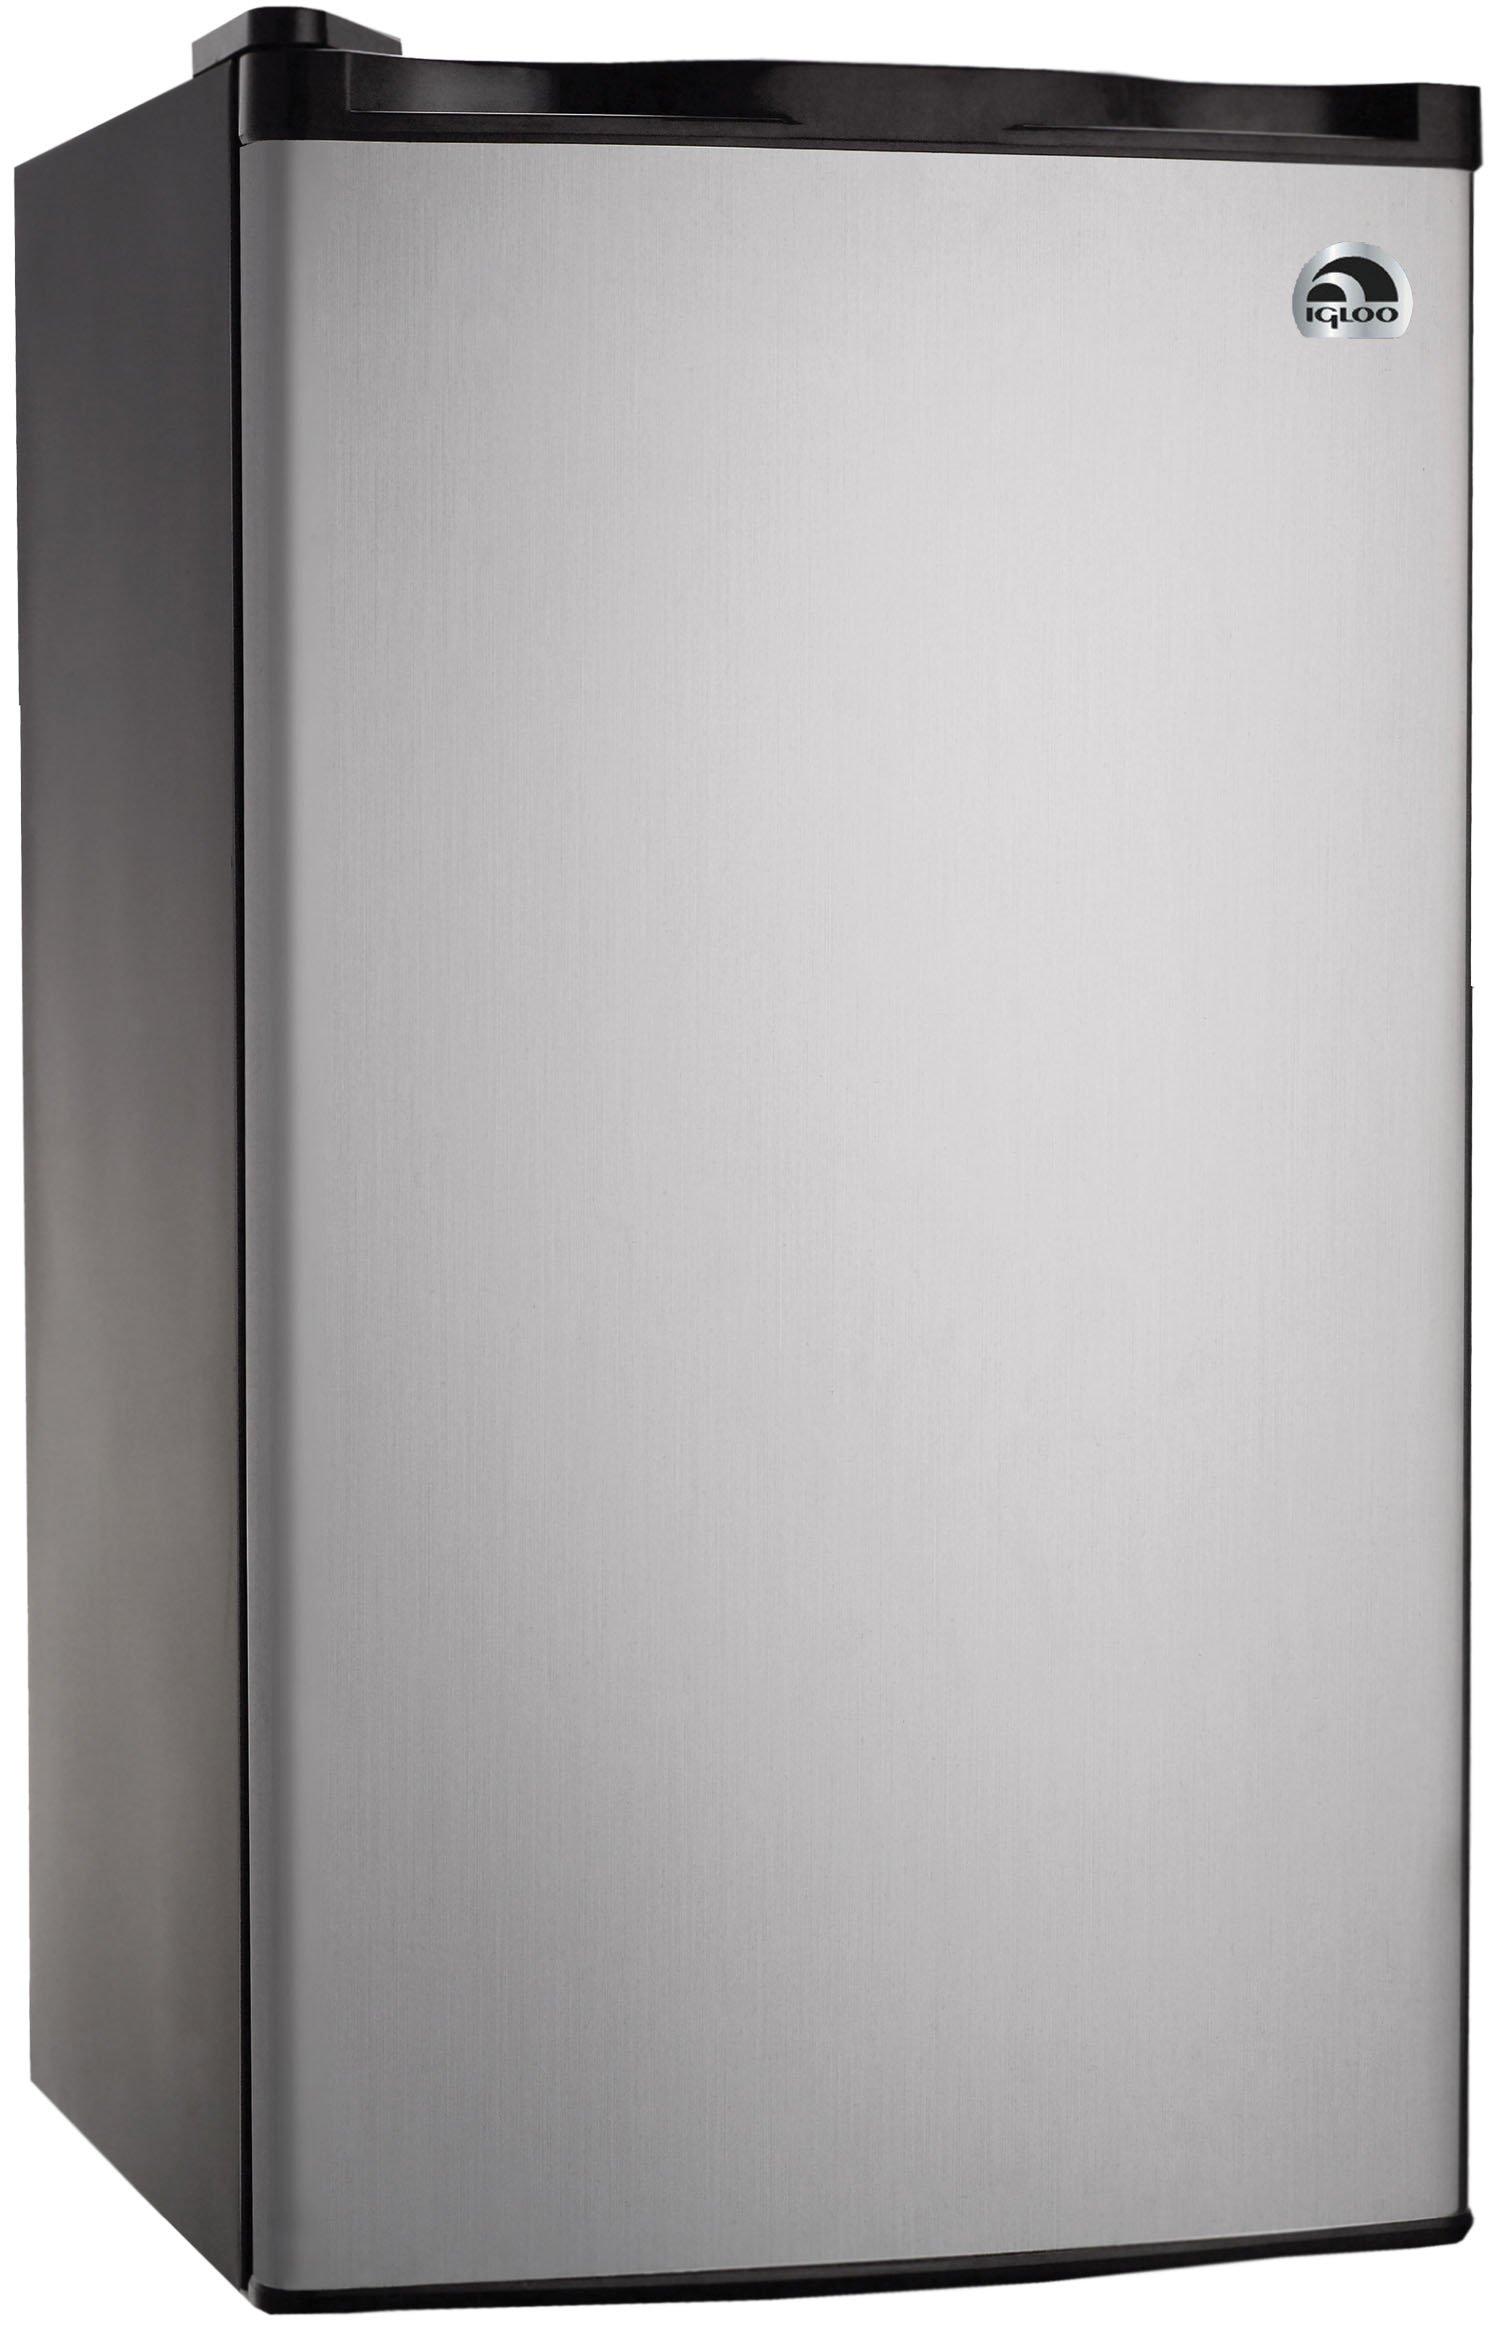 RCA RFR321-FR320/8 IGLOO Mini Refrigerator, 3.2 Cu Ft Fridge, Stainless Steel